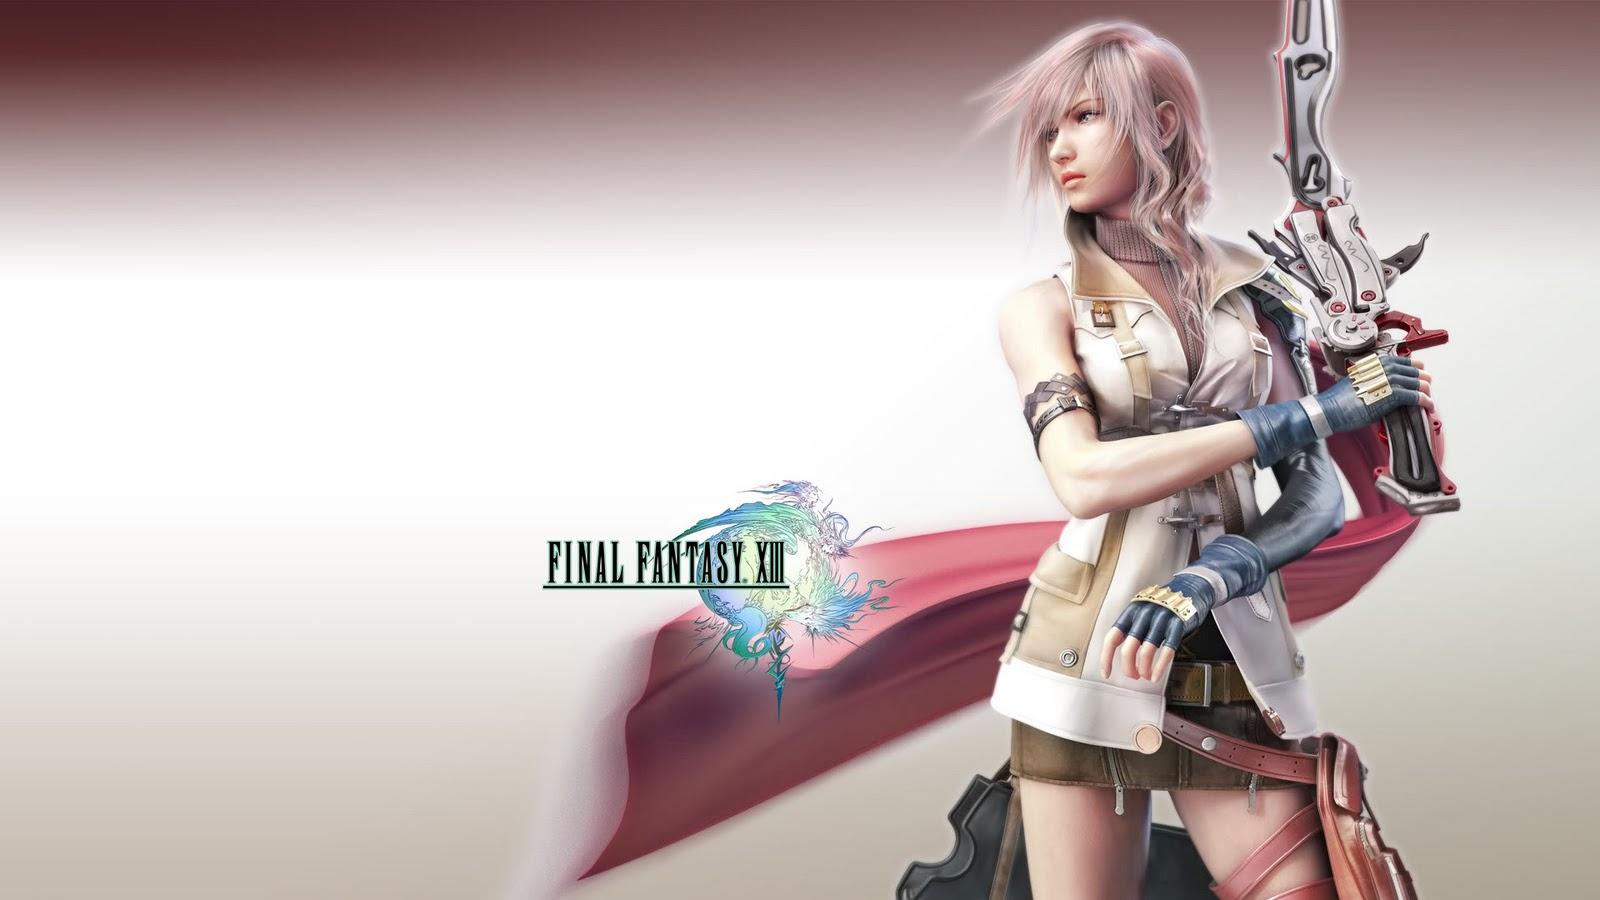 final-fantasy-wallpapers-10-game-final-fantasy-iii-lightning-wallpaper